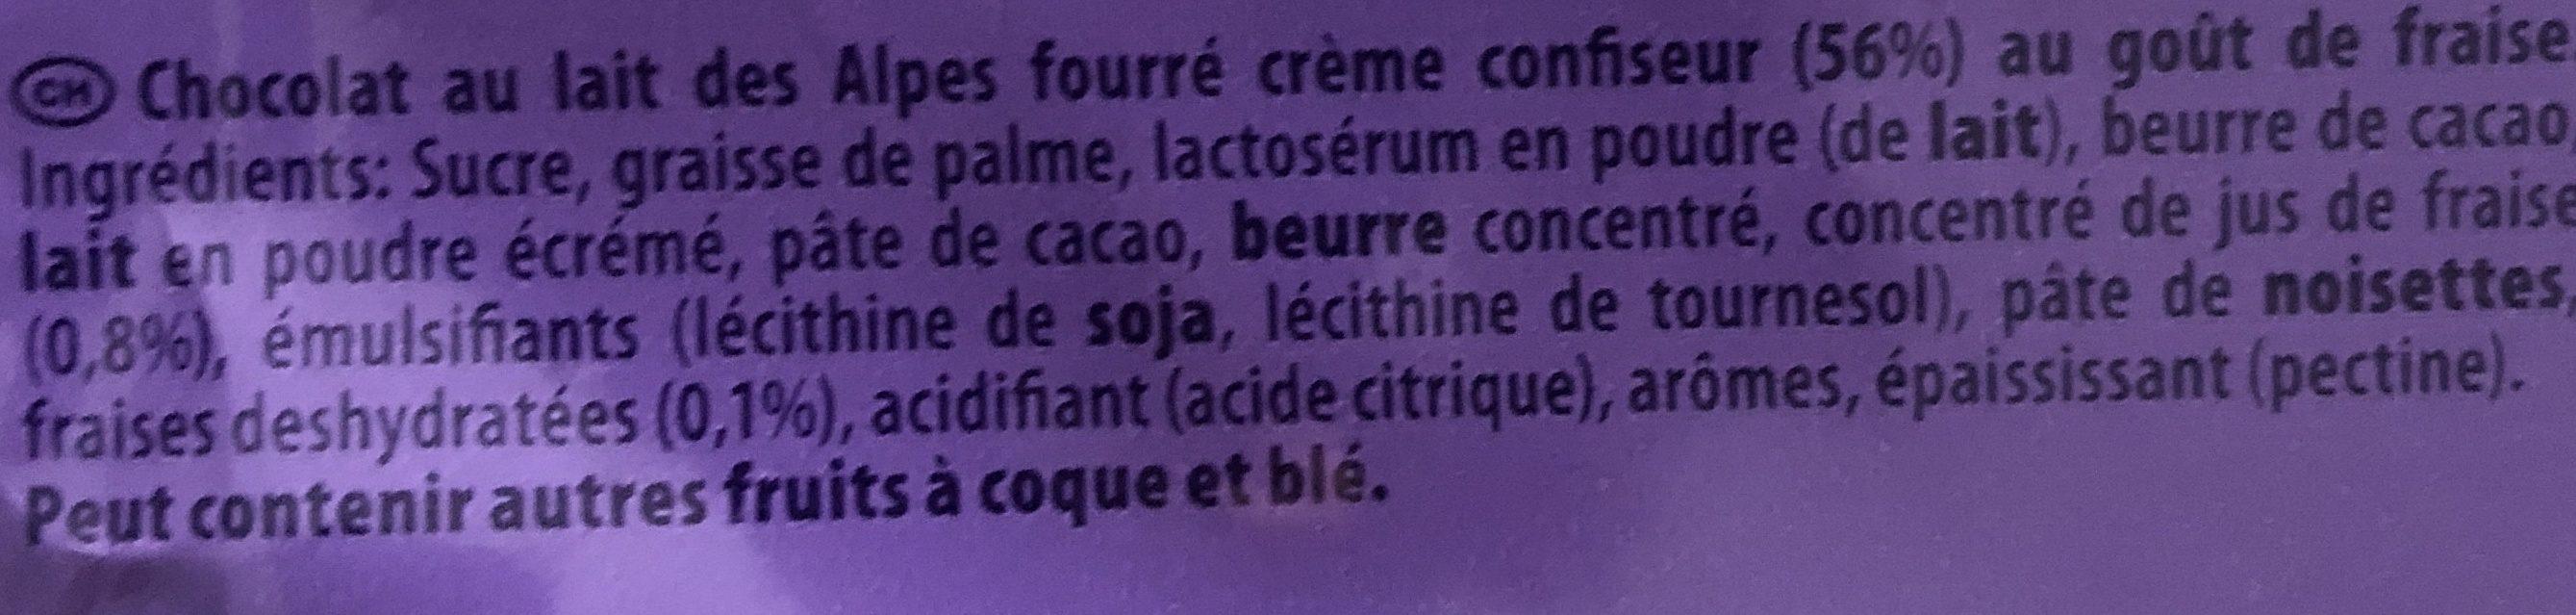 Kraft Foods Milka Alpesi Tejcsokol?d? - Epres Joghurtos 300 g - Ingrediënten